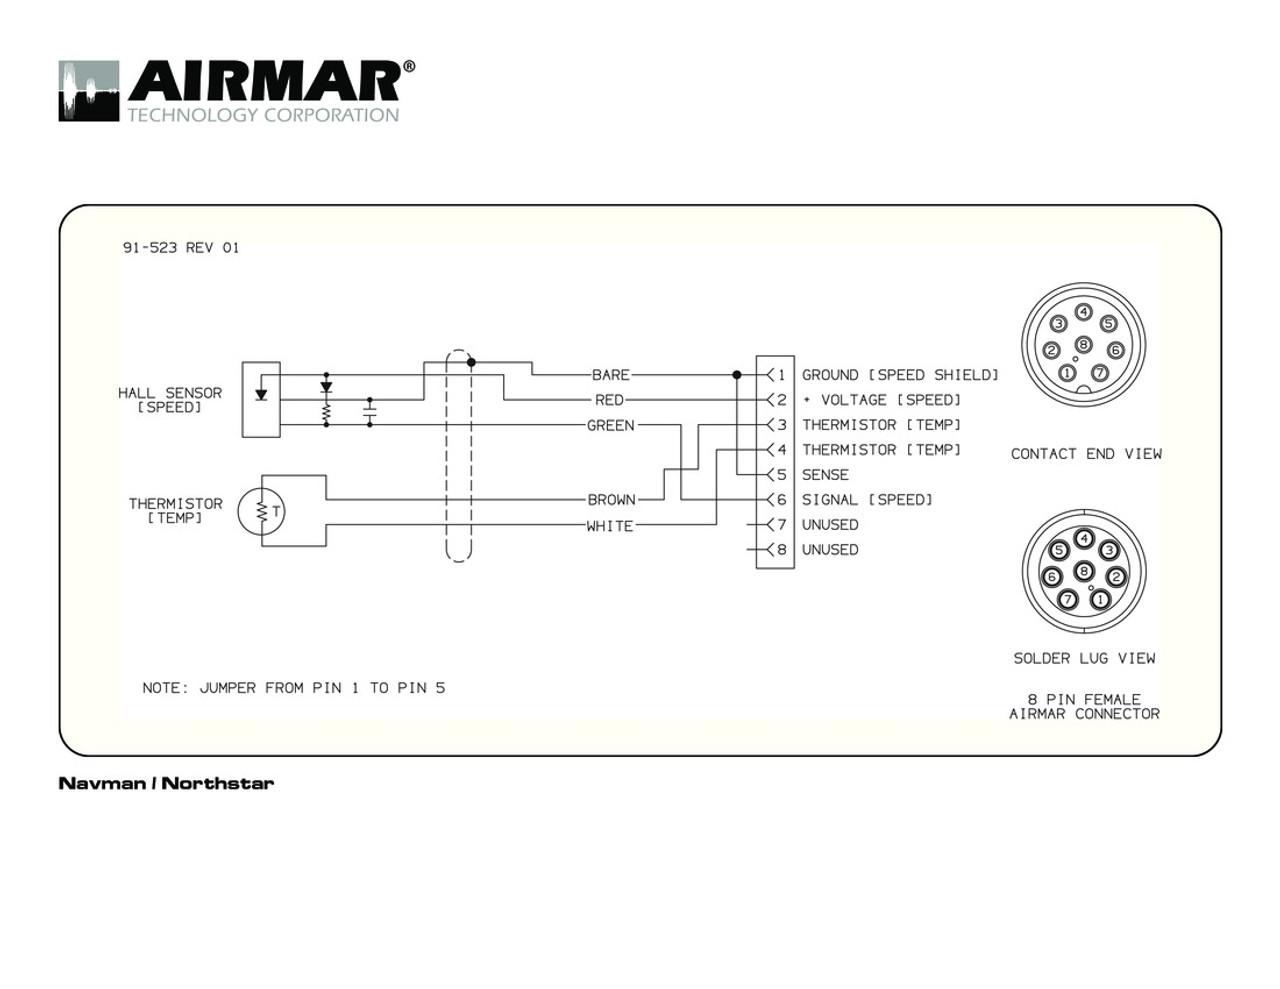 samsung sigtronics wiring diagram electrical wiring diagram on apple headphone wire diagram samsung galaxy s4  [ 1280 x 989 Pixel ]